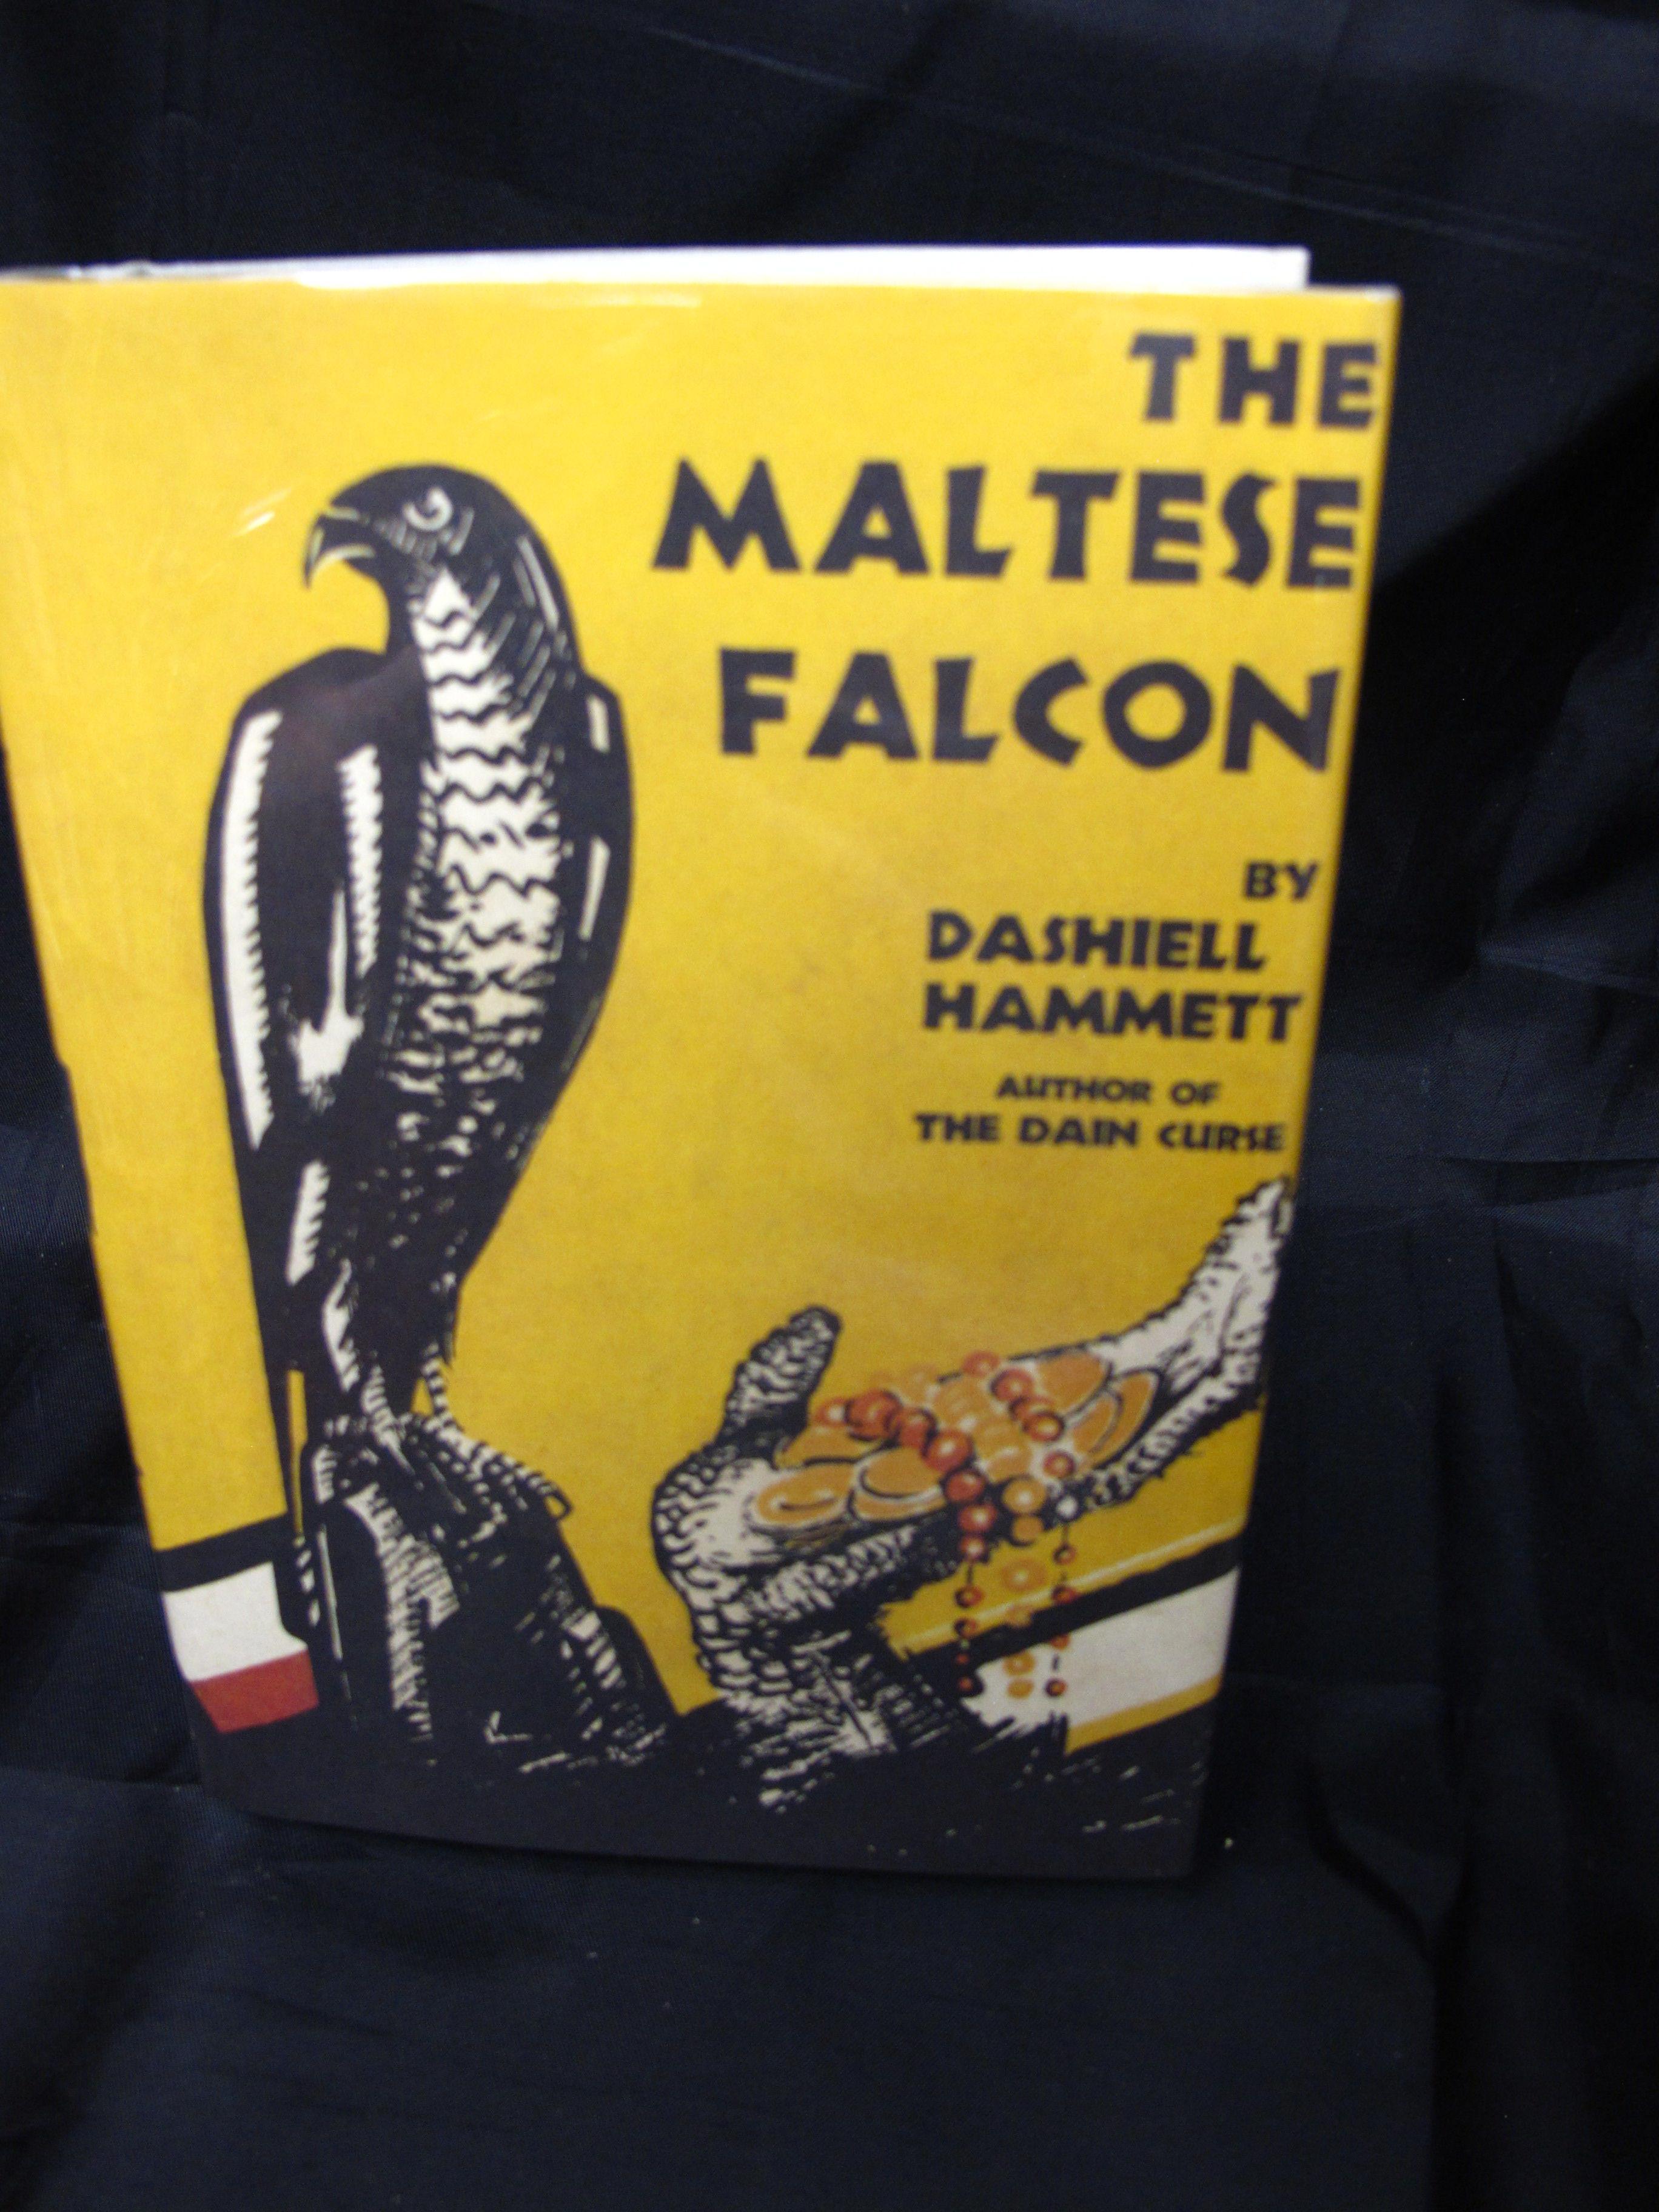 An analysis of the maltese falcon a novel by dashiell hammett